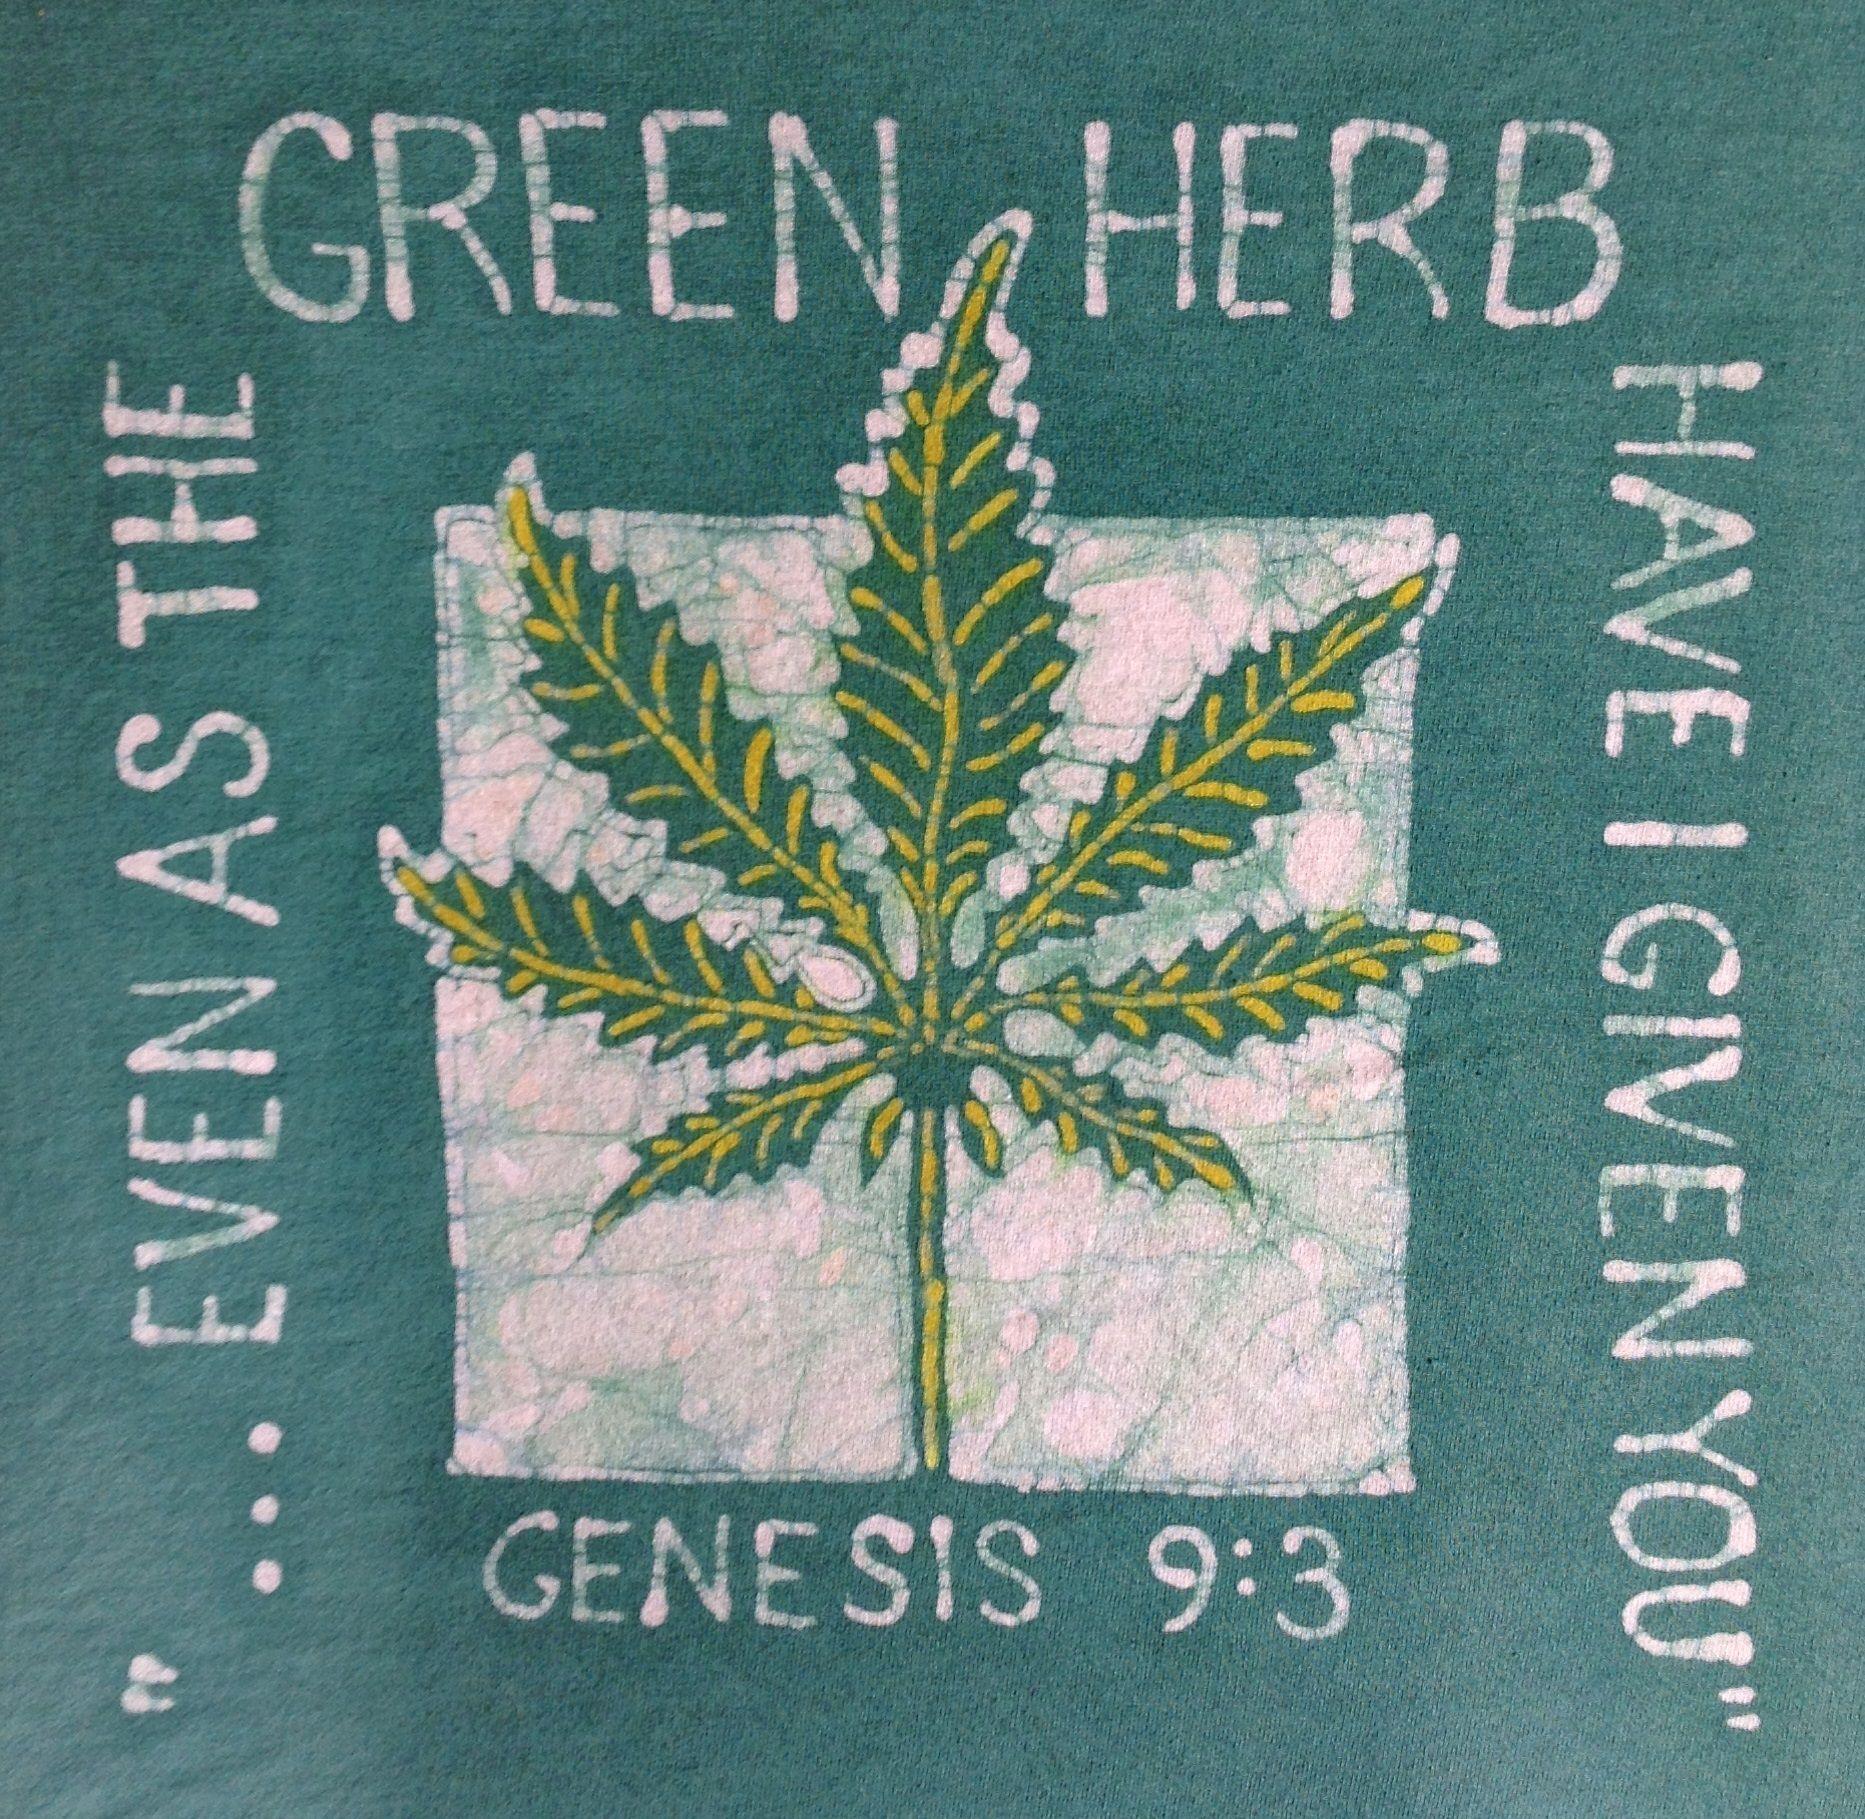 The Green Herb Batik Tshirt | Say What? | Pinterest